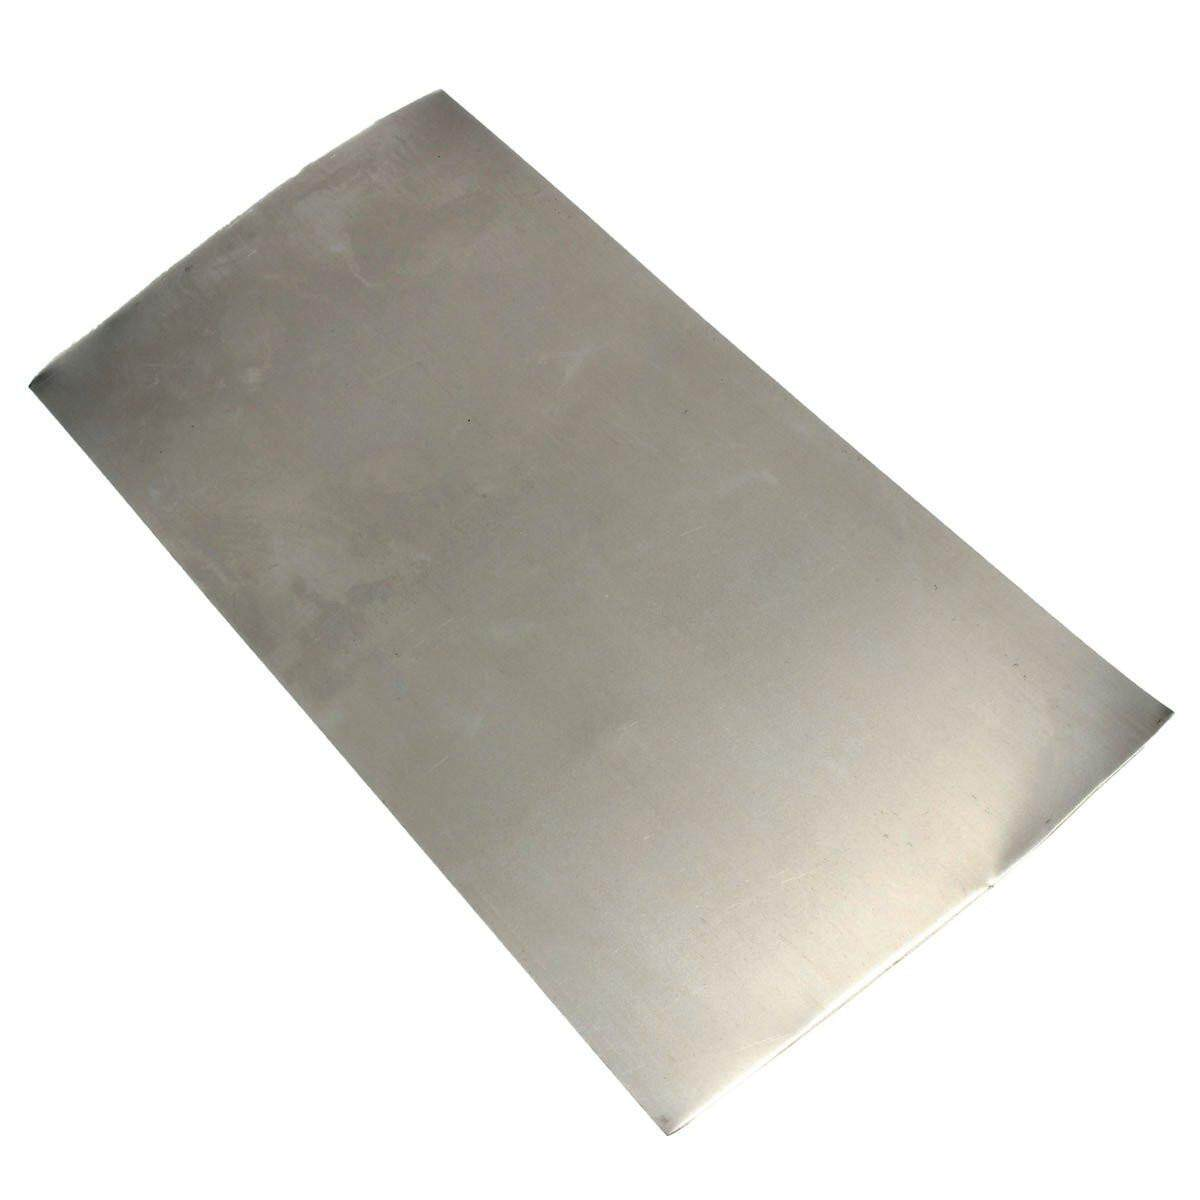 Metal High Purity Nickel Thin Sheet Plate Ni Foil 0.3mm x 100mm x 200mm Tool US